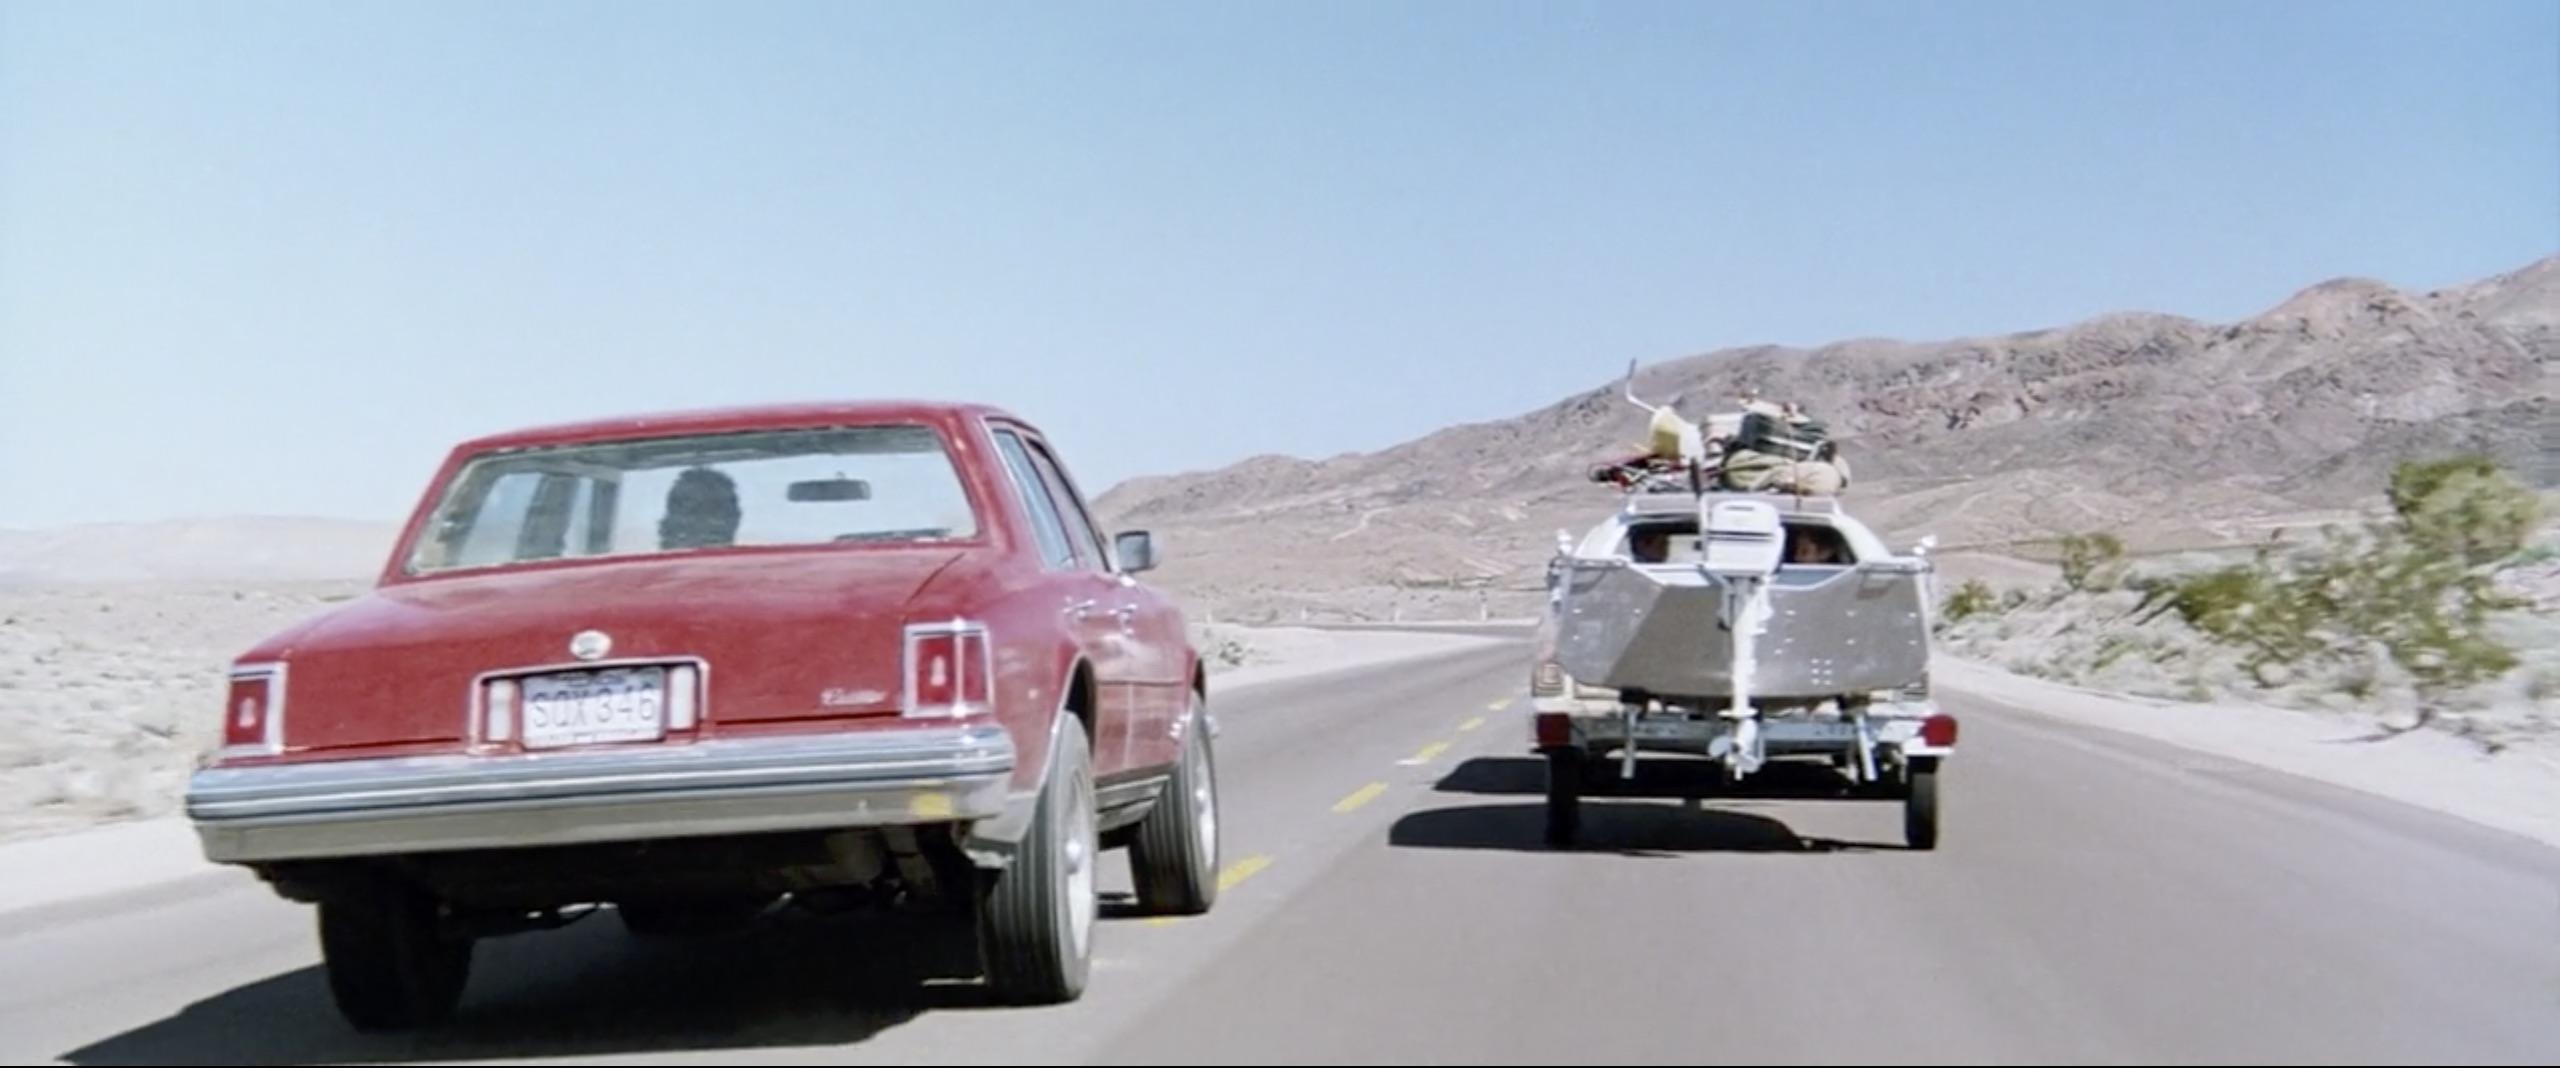 hitcher car chasing boat trailer